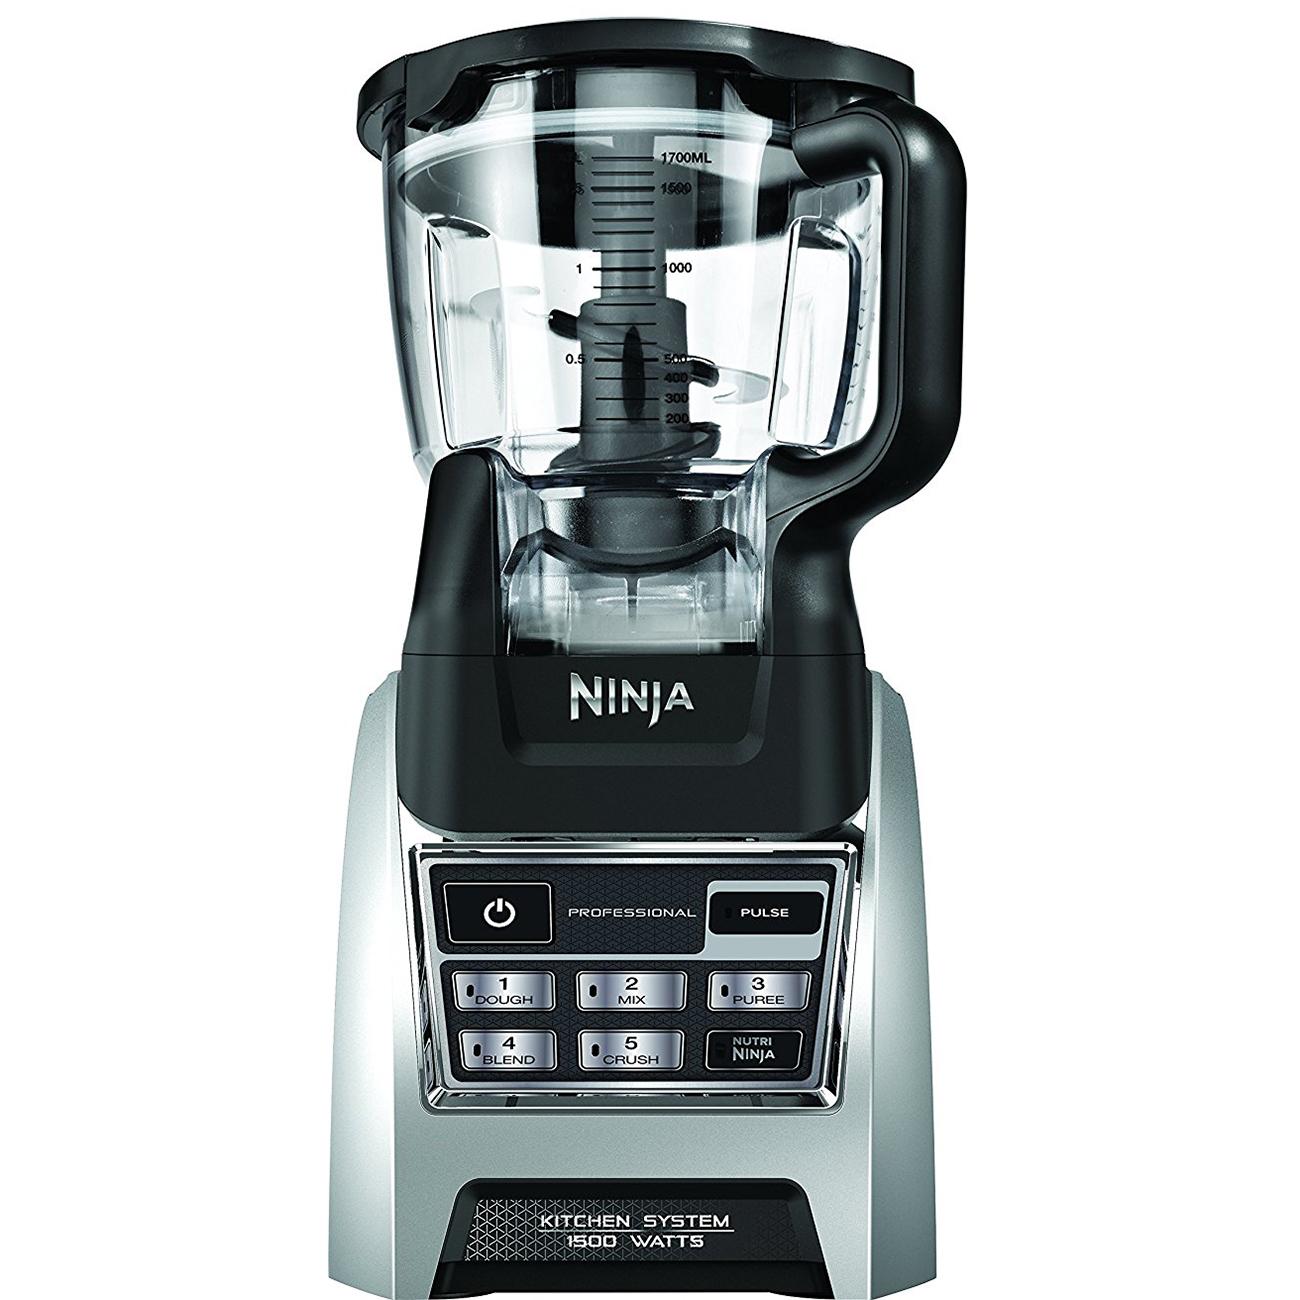 Ninja 1500W 72 Ounce Powerful Professional Kitchen Blender